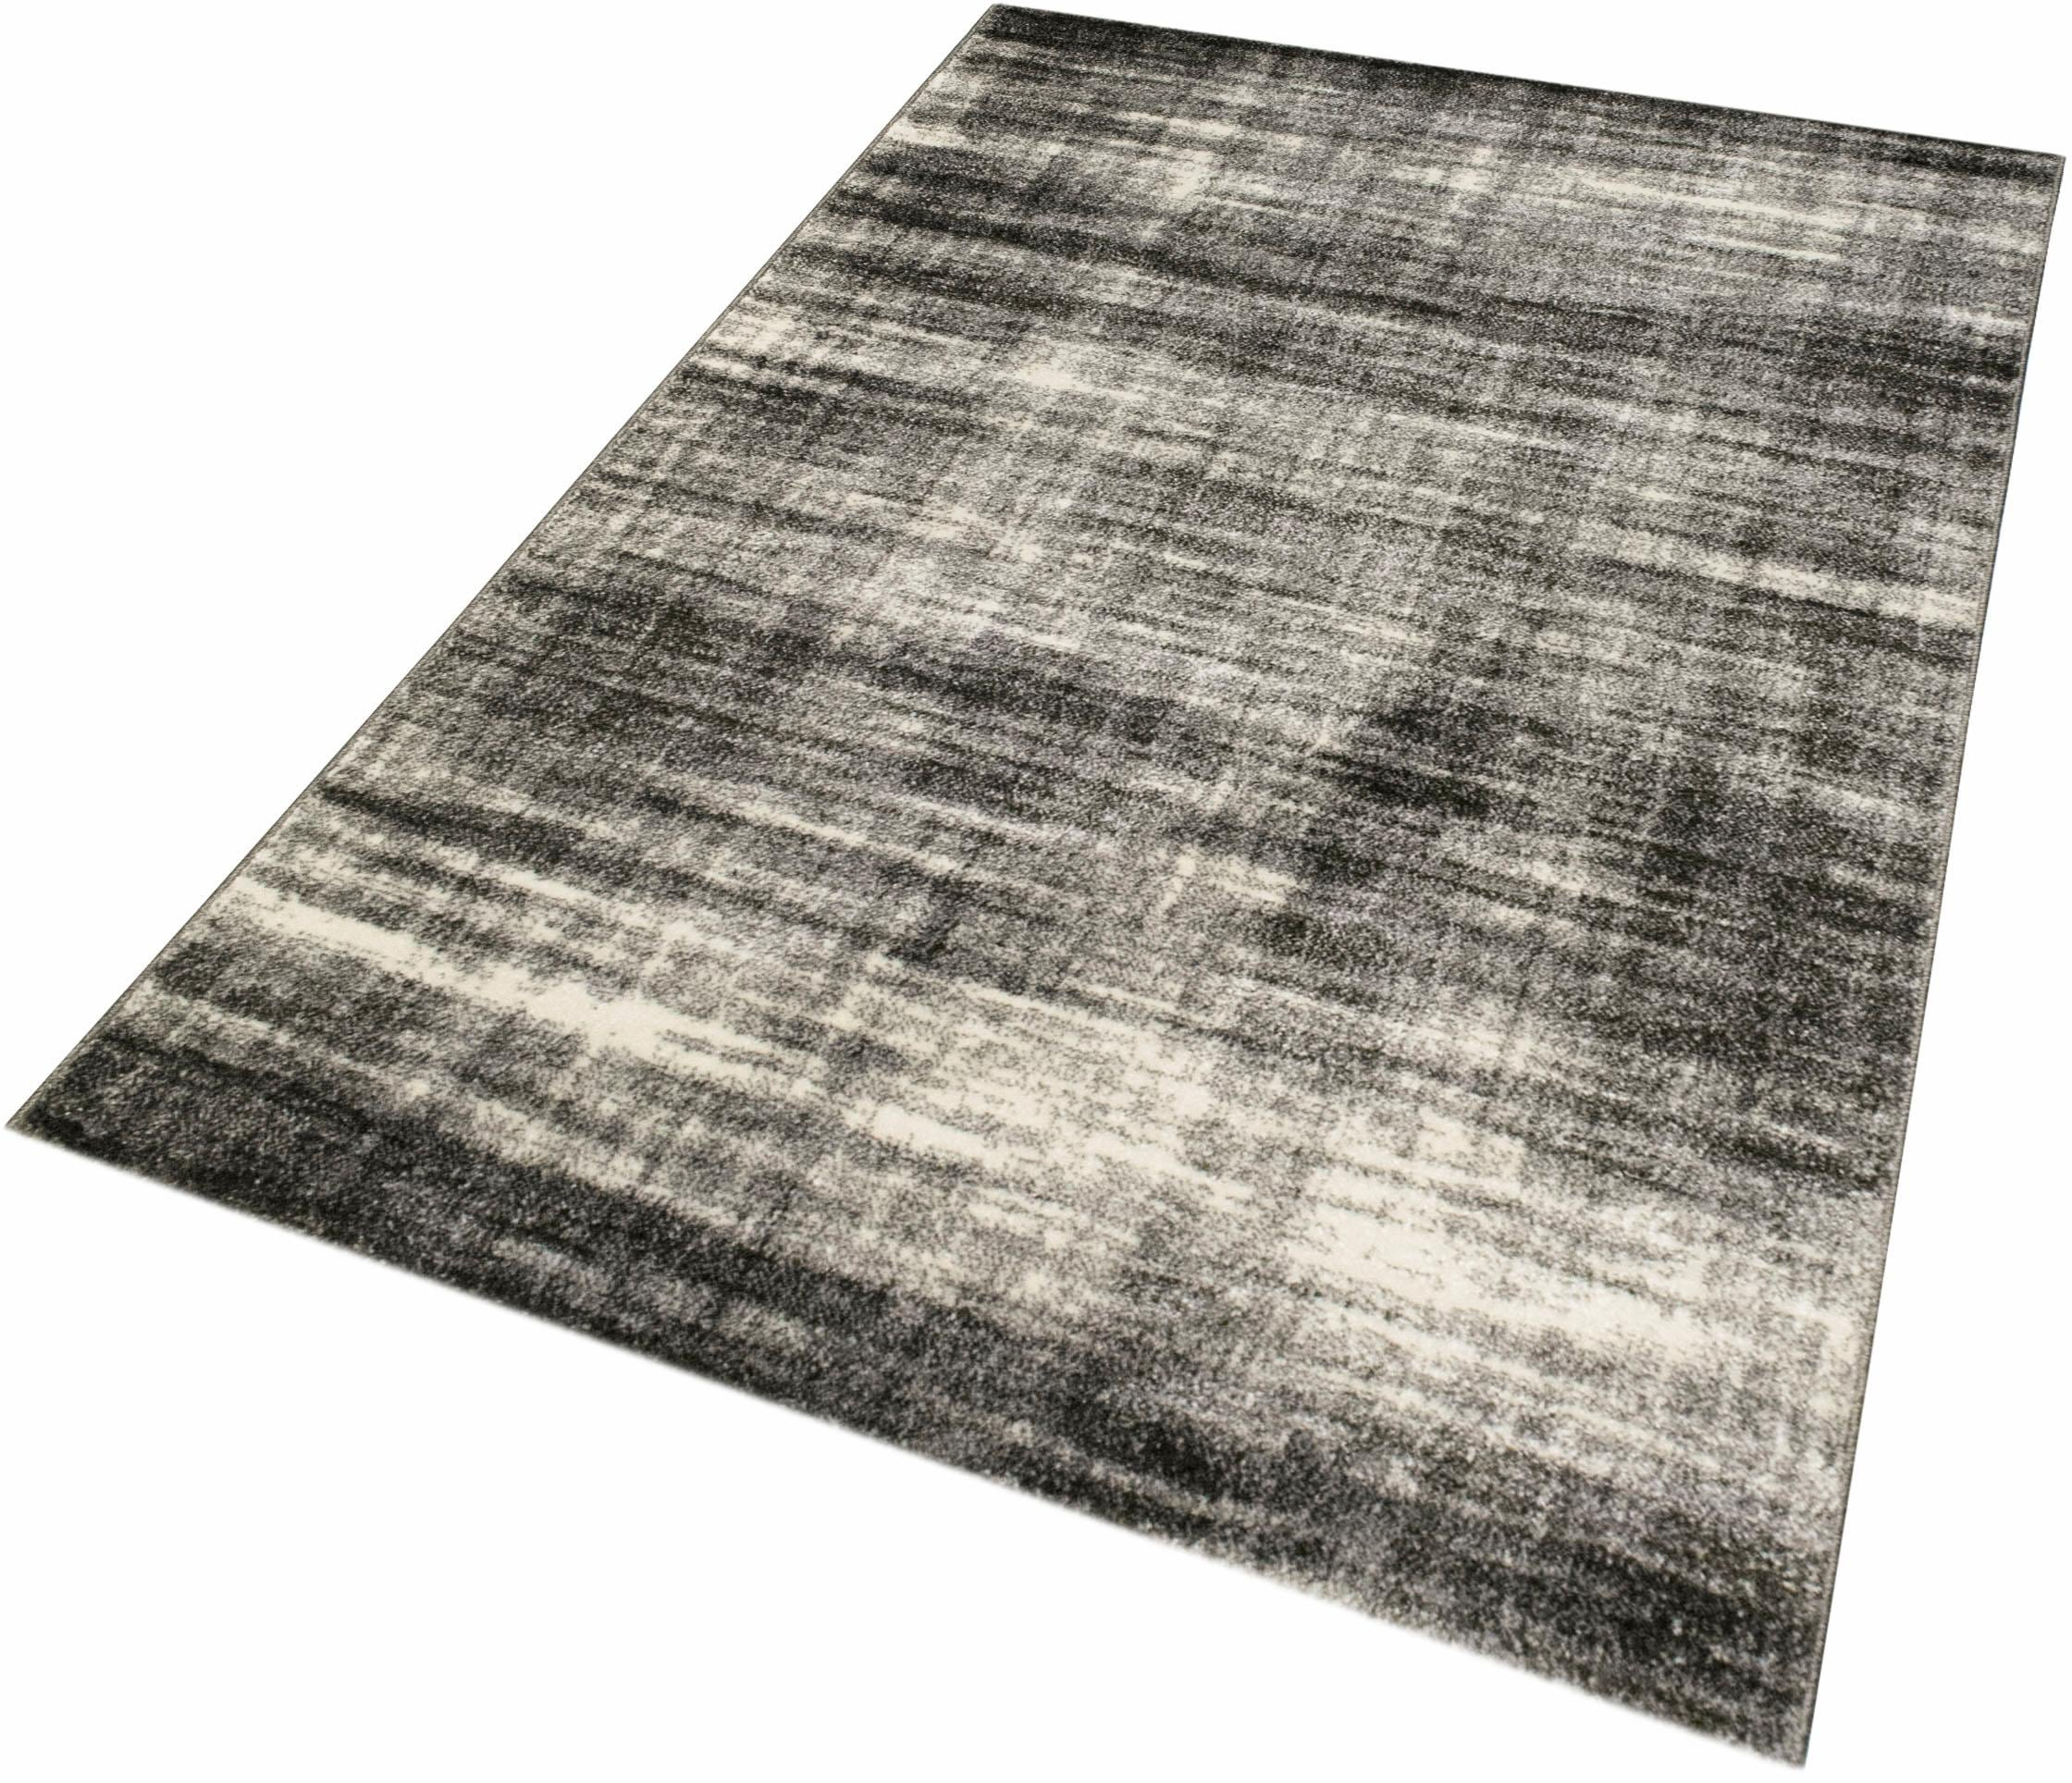 Teppich, »Pienza 11582«, Festival, rechteckig, Höhe 9 mm, maschinell gewebt